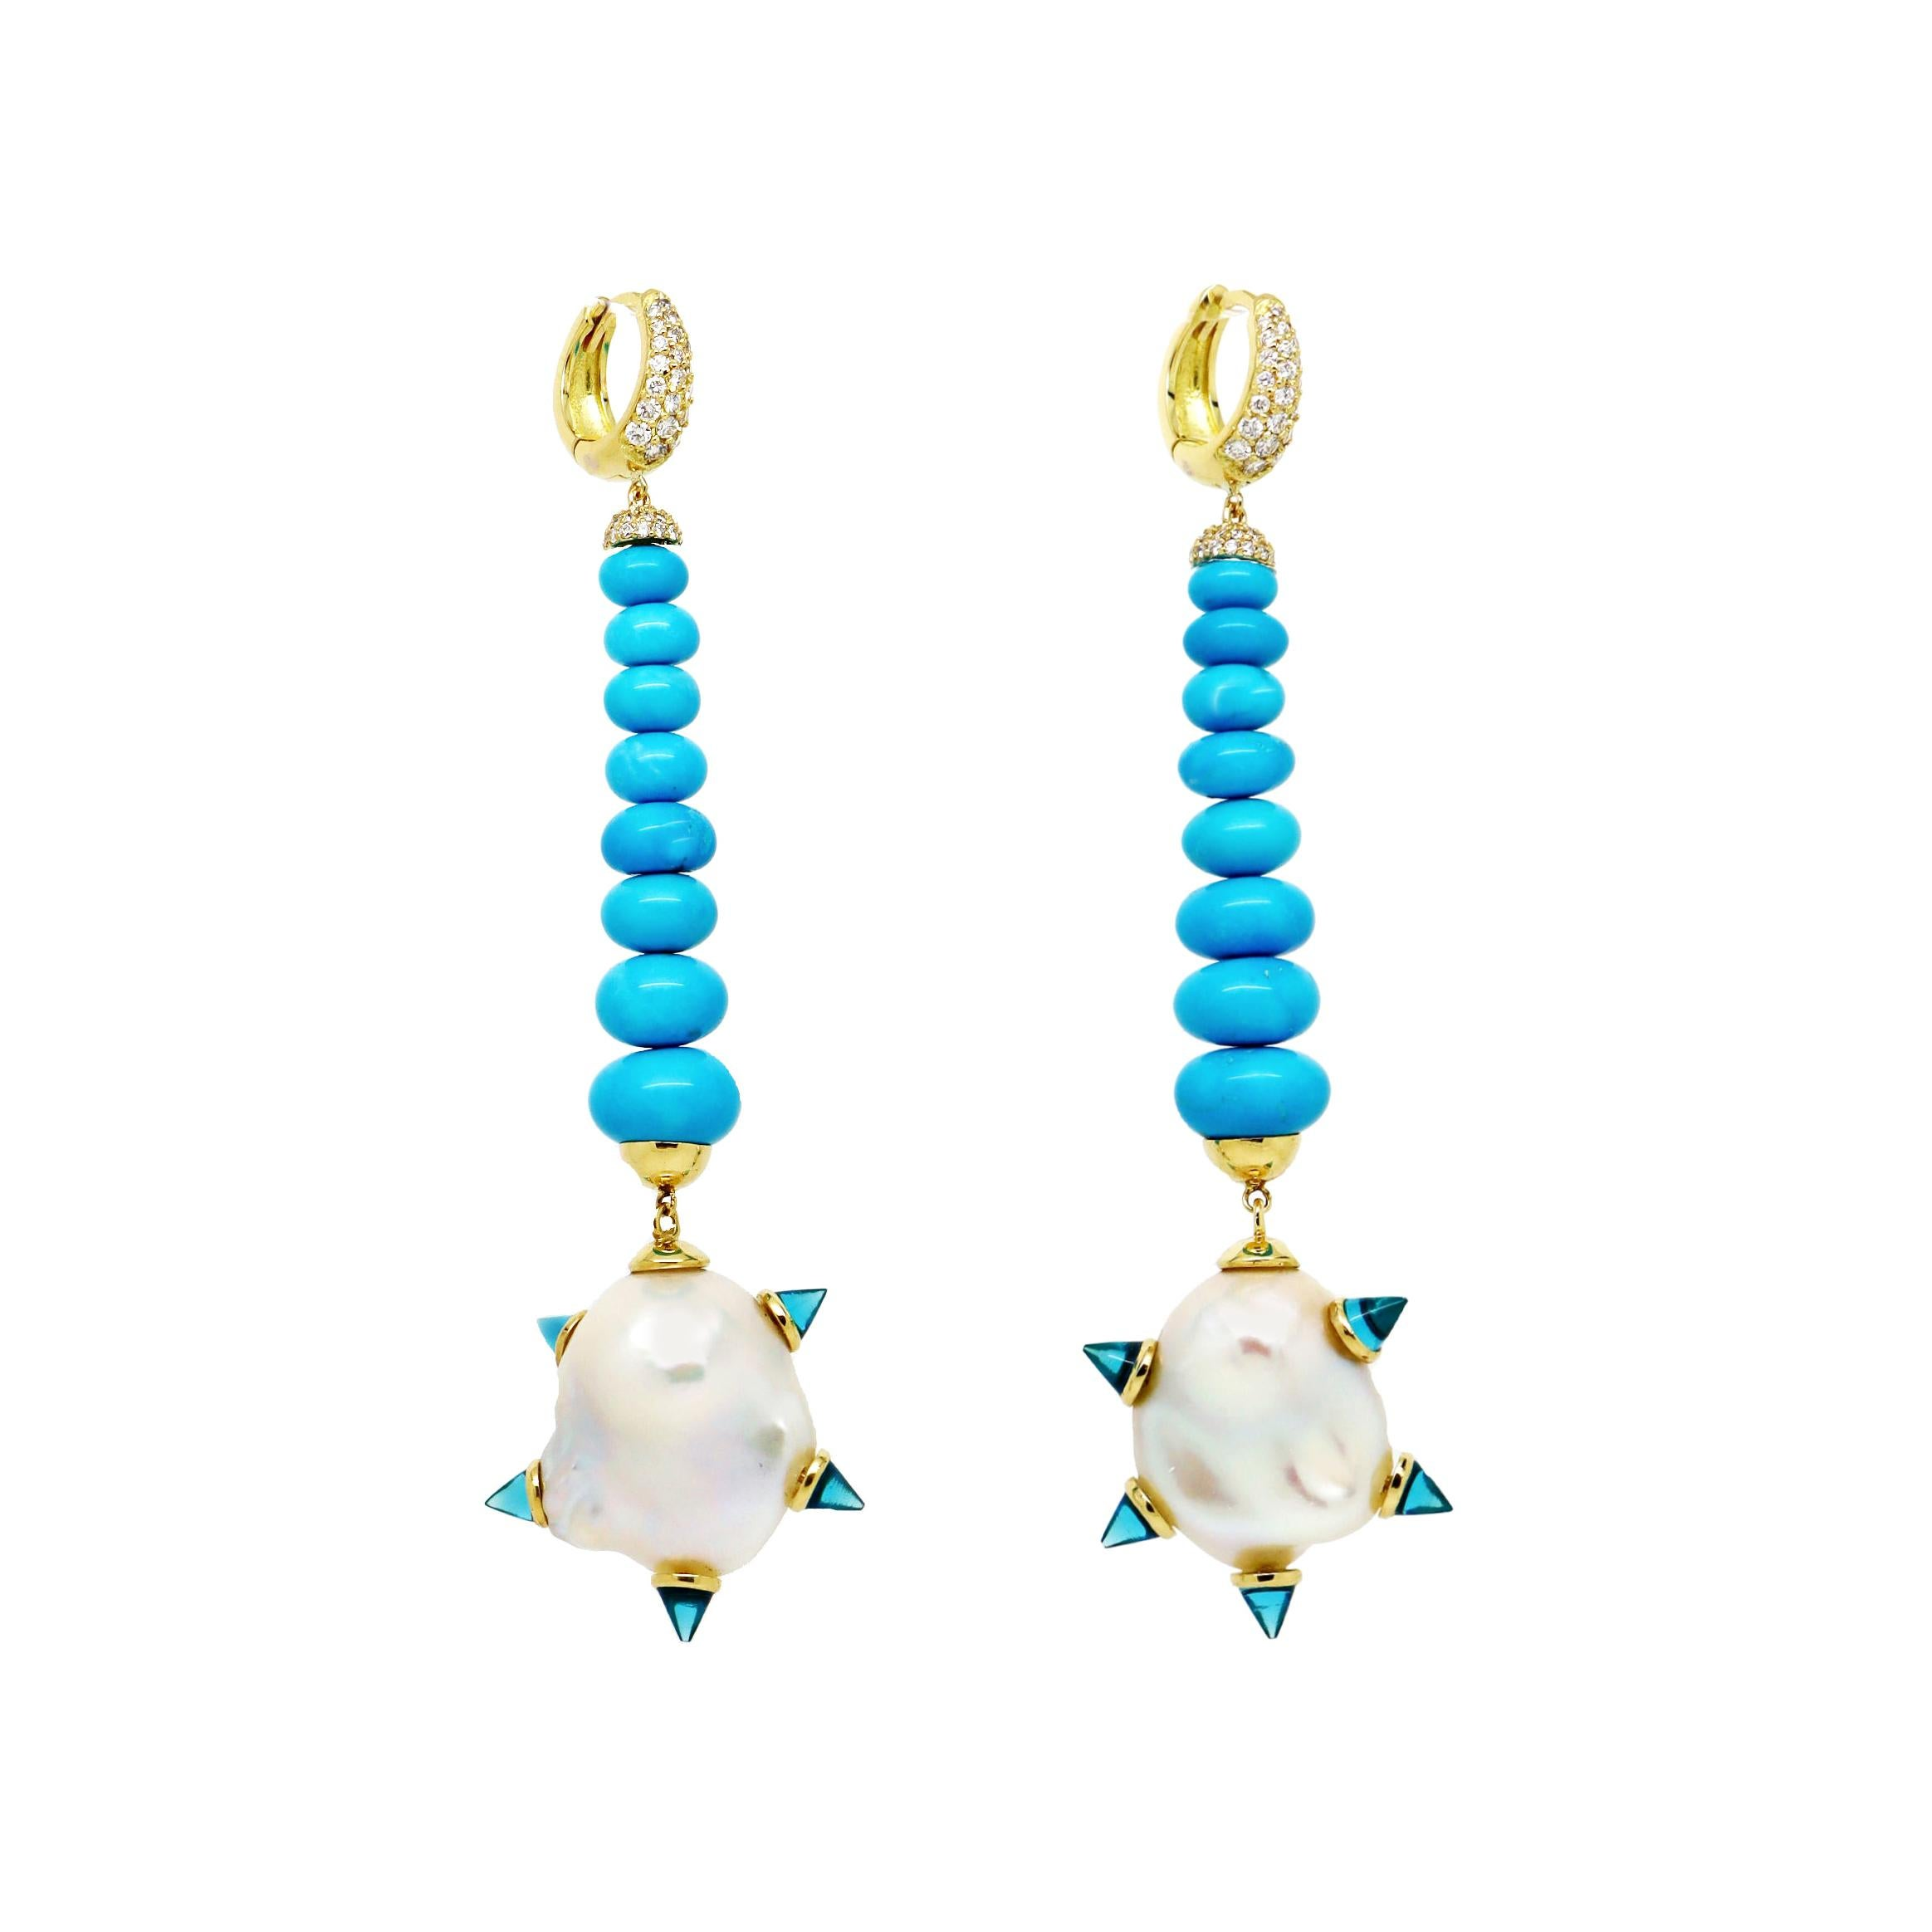 Baroque Pearl Diamond Turquoise Drop Earrings, London Blue Topaz, 18k Gold